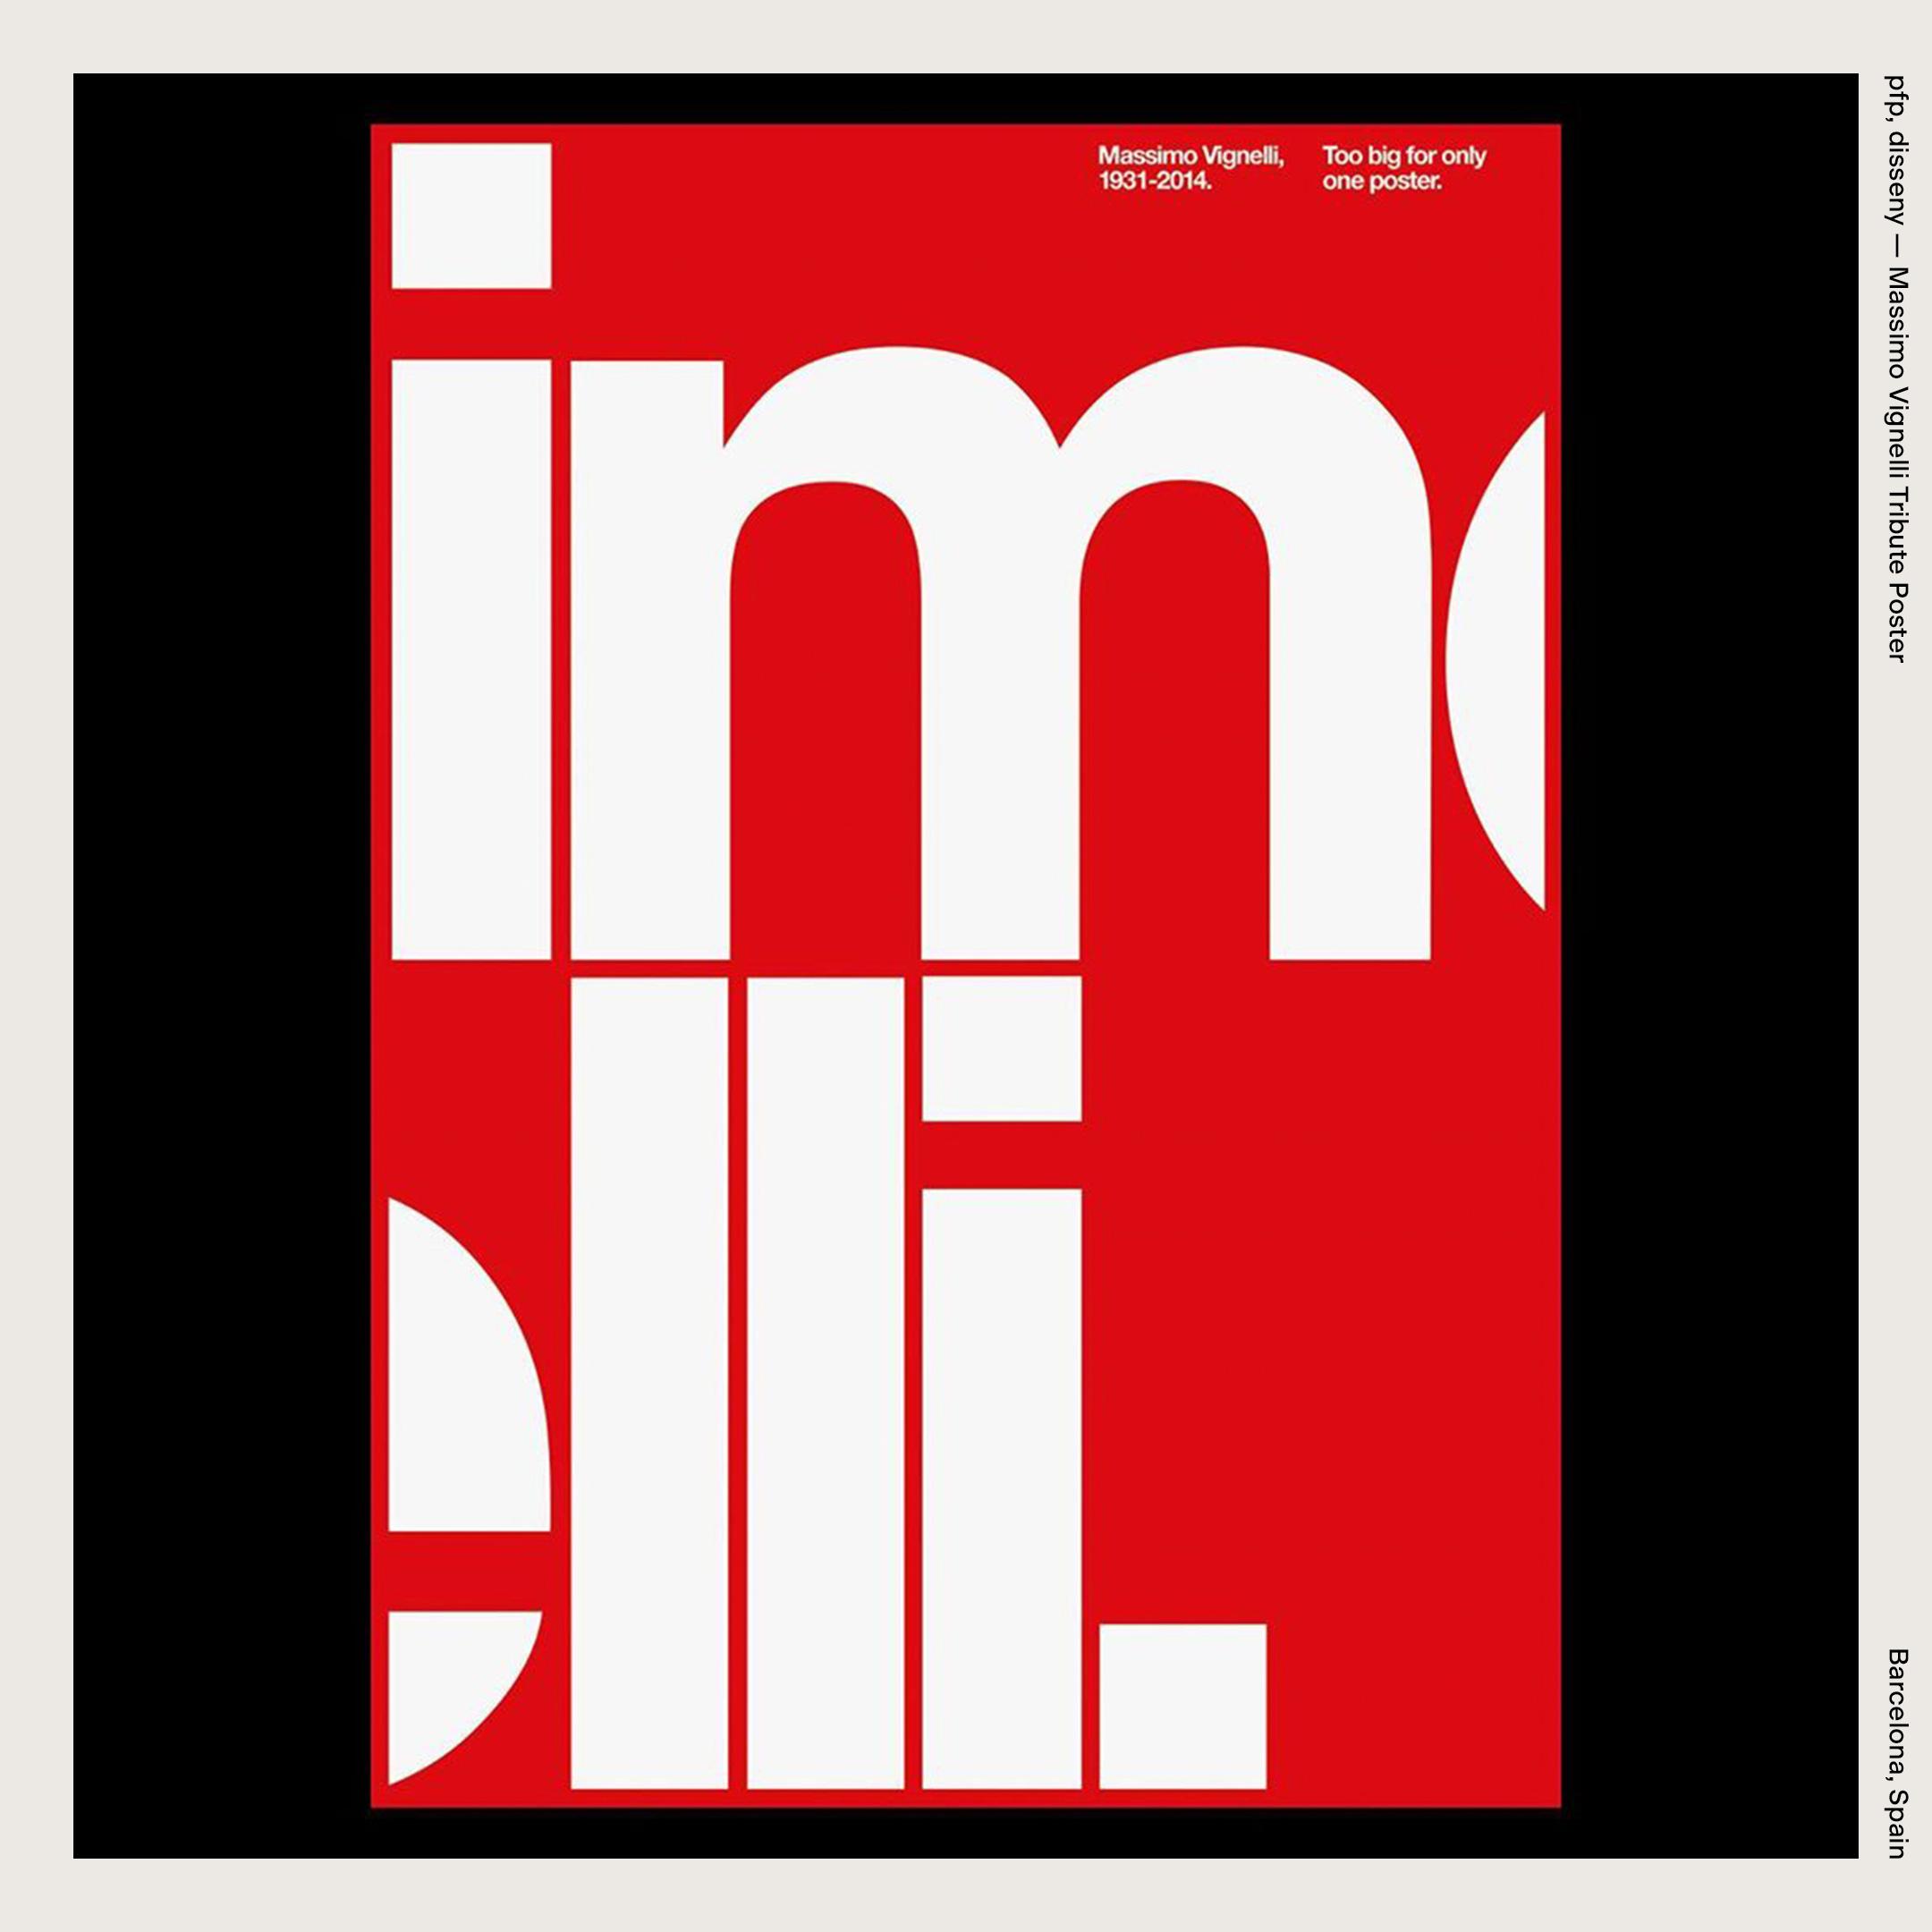 pfp, disseny — Massimo Vignelli Tribute Poster